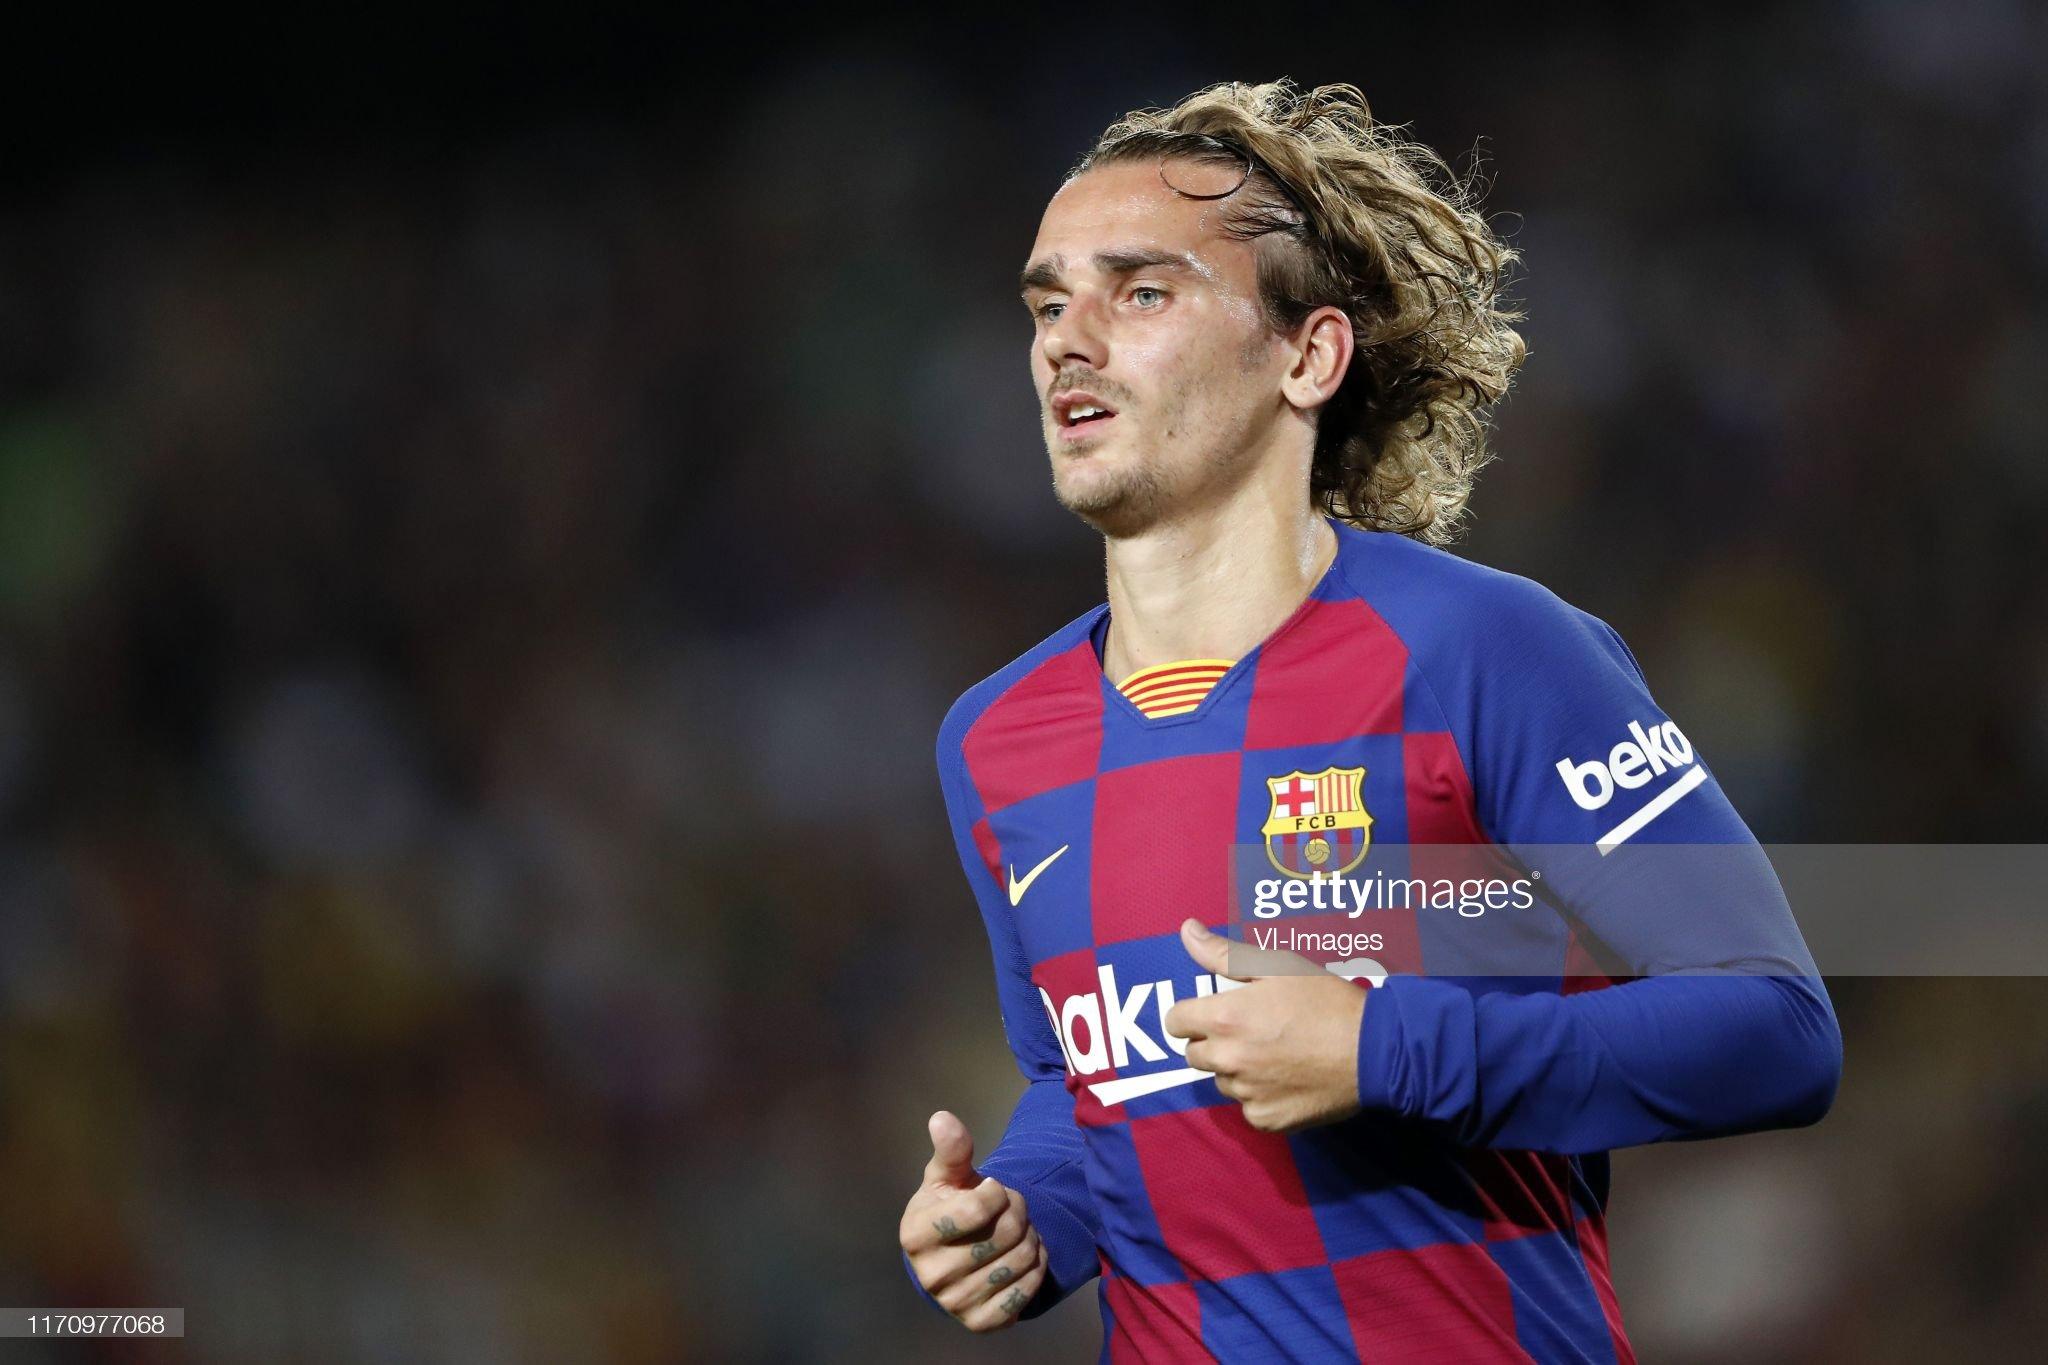 صور مباراة : برشلونة - فياريال 2-1 ( 24-09-2019 )  Antoine-griezmann-of-fc-barcelona-during-the-laliga-santander-match-picture-id1170977068?s=2048x2048